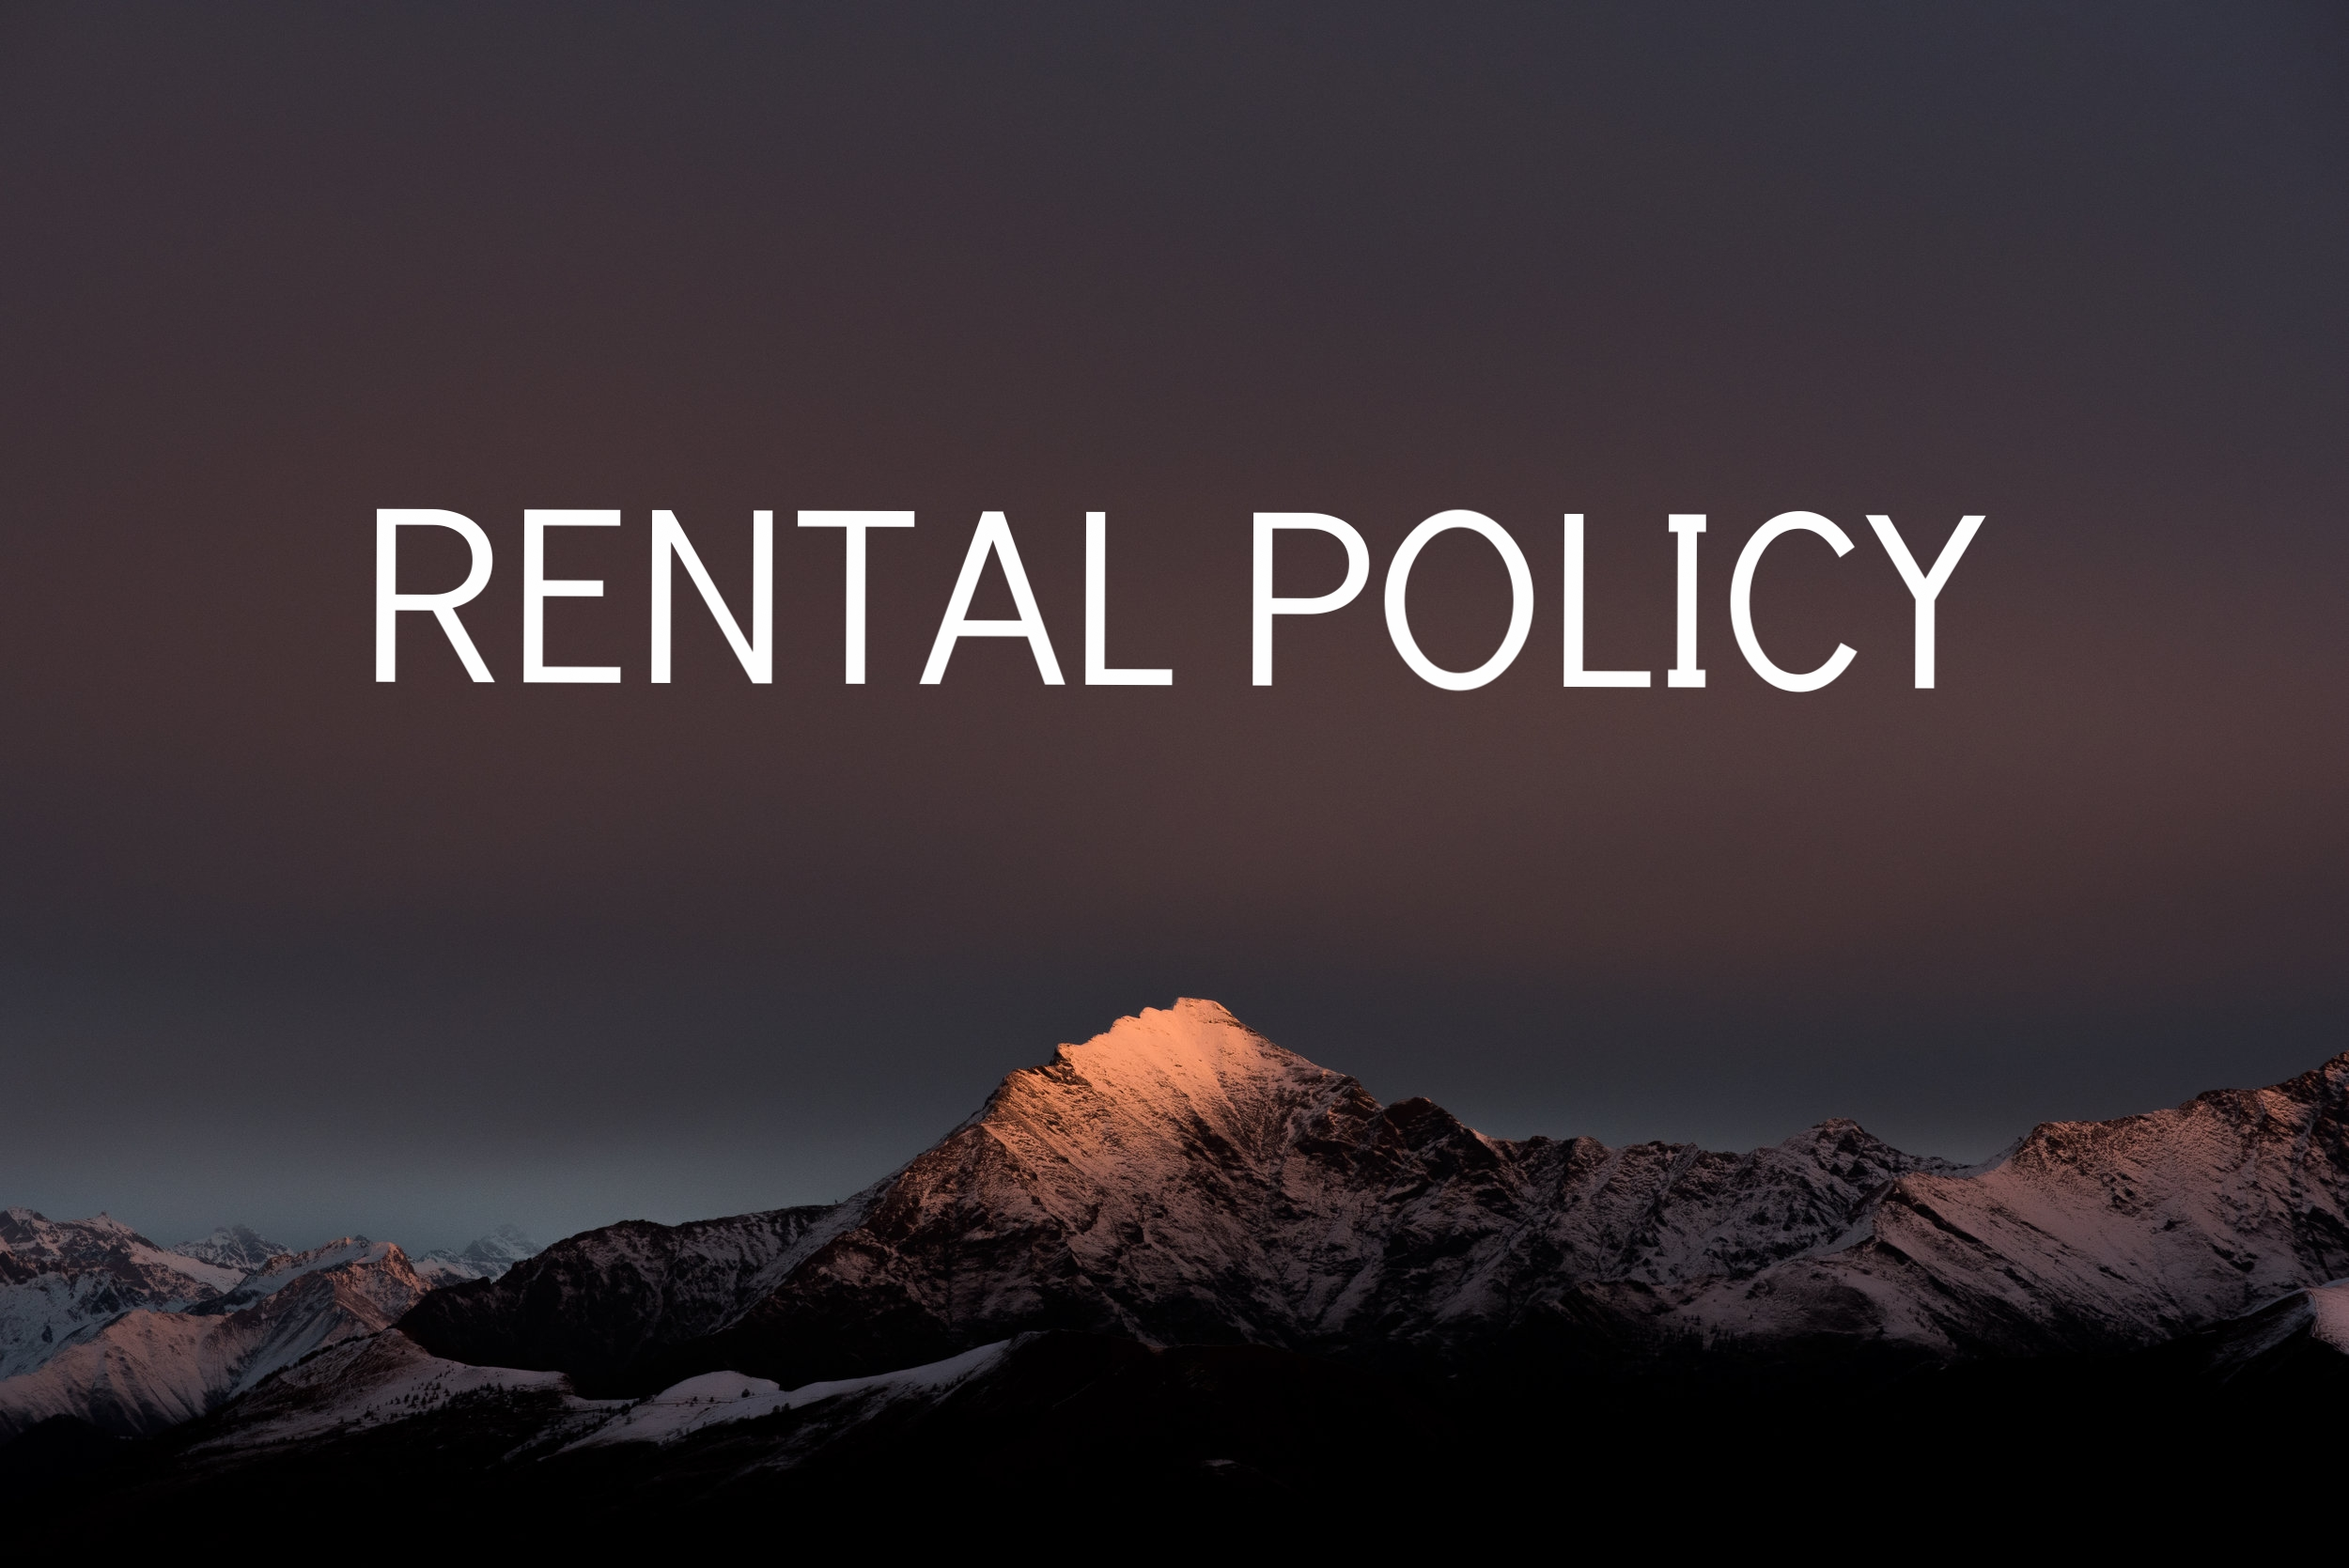 crockery rental policy